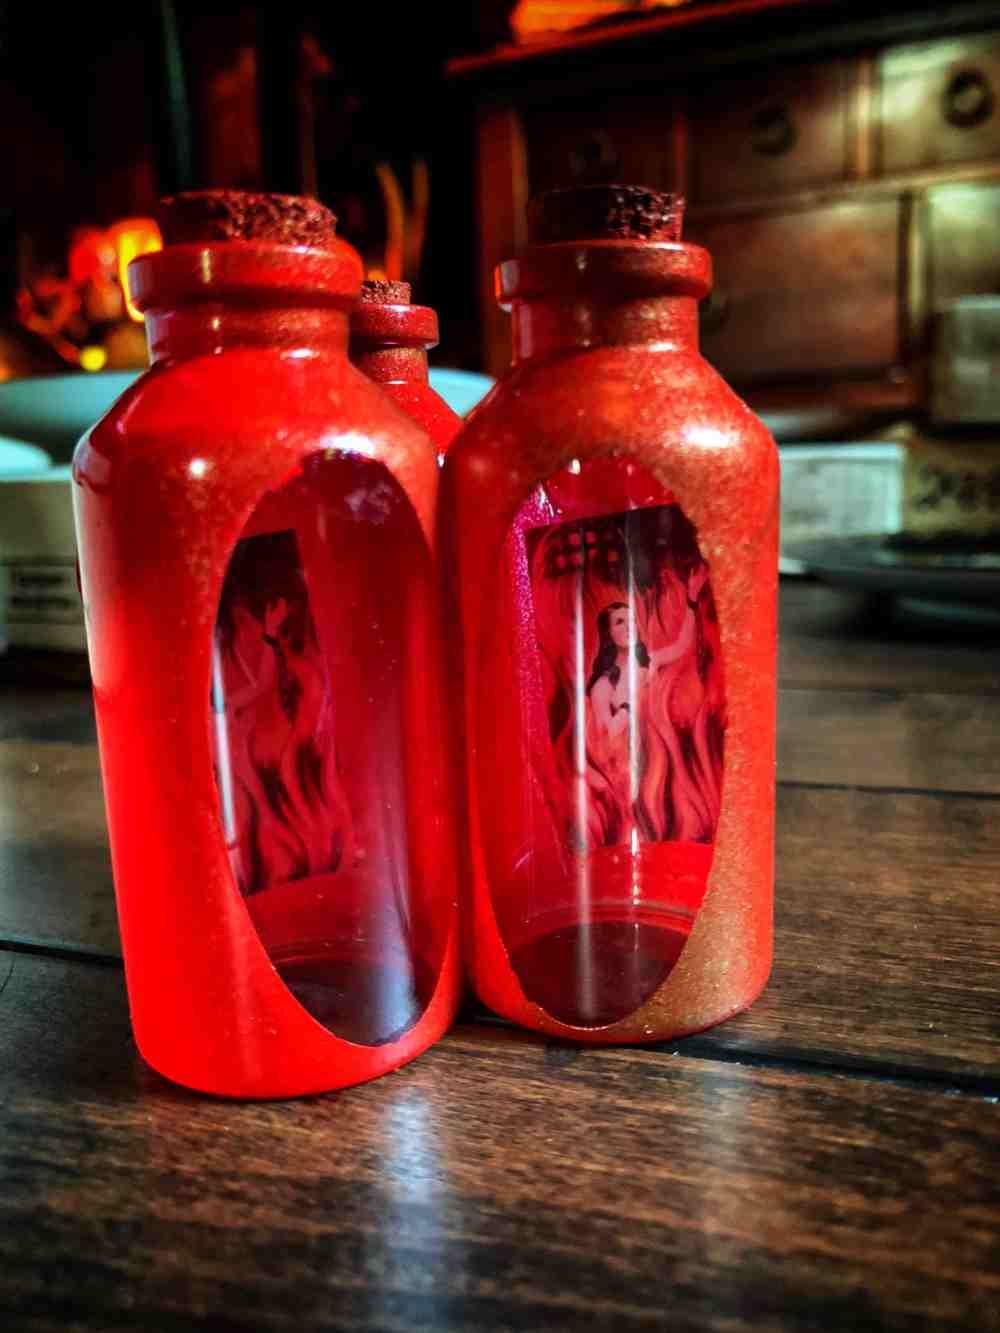 Anima Sola (lonely soul) Bottle Spell